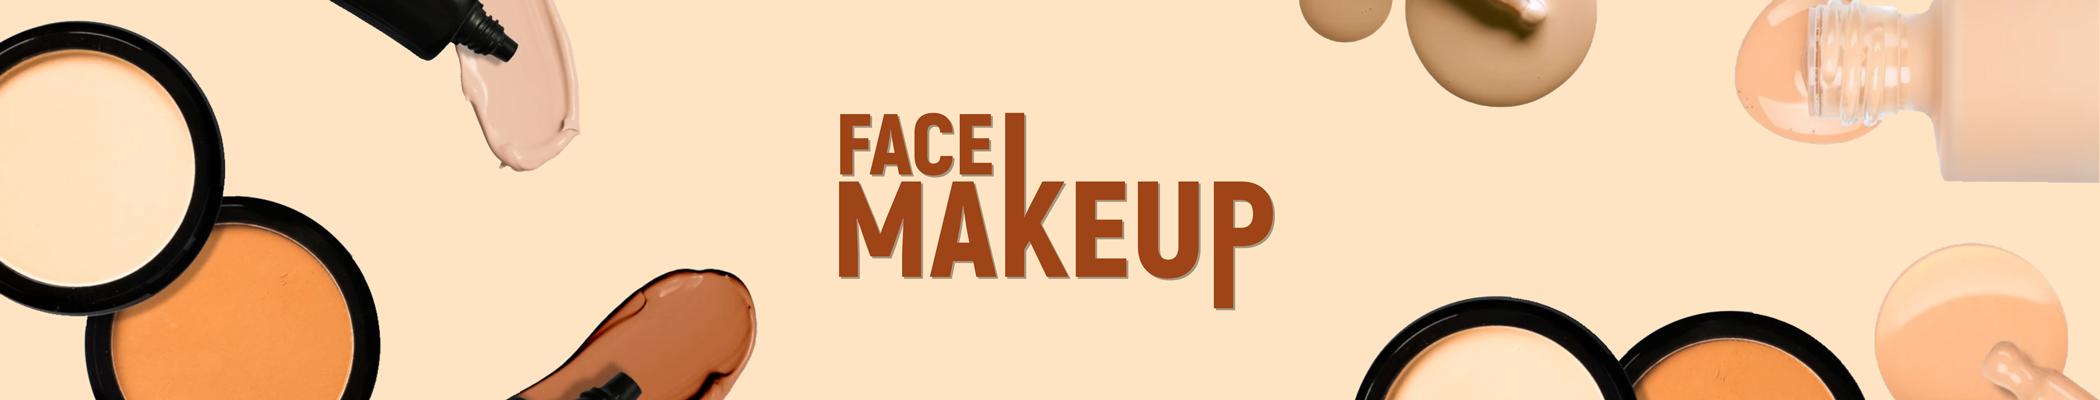 Face Makeup Banner